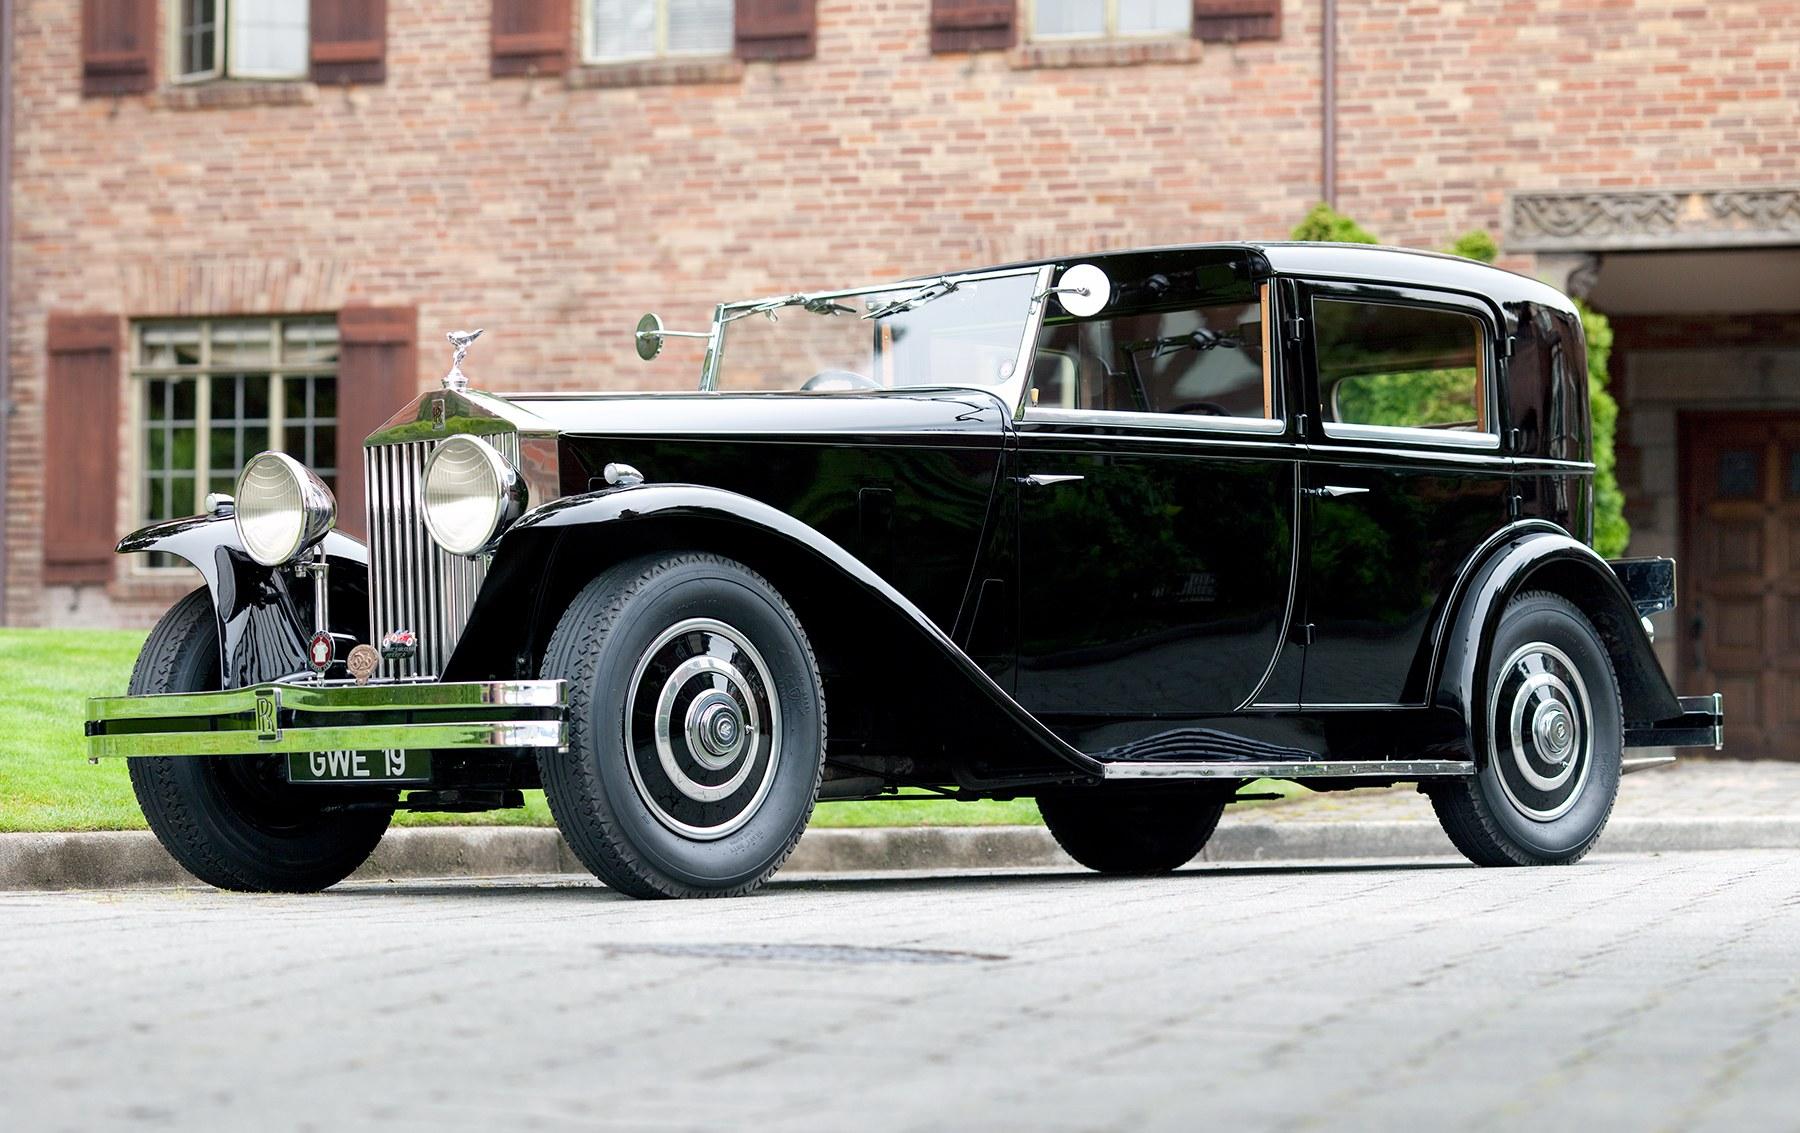 1934 Rolls-Royce 20/25 Town Car